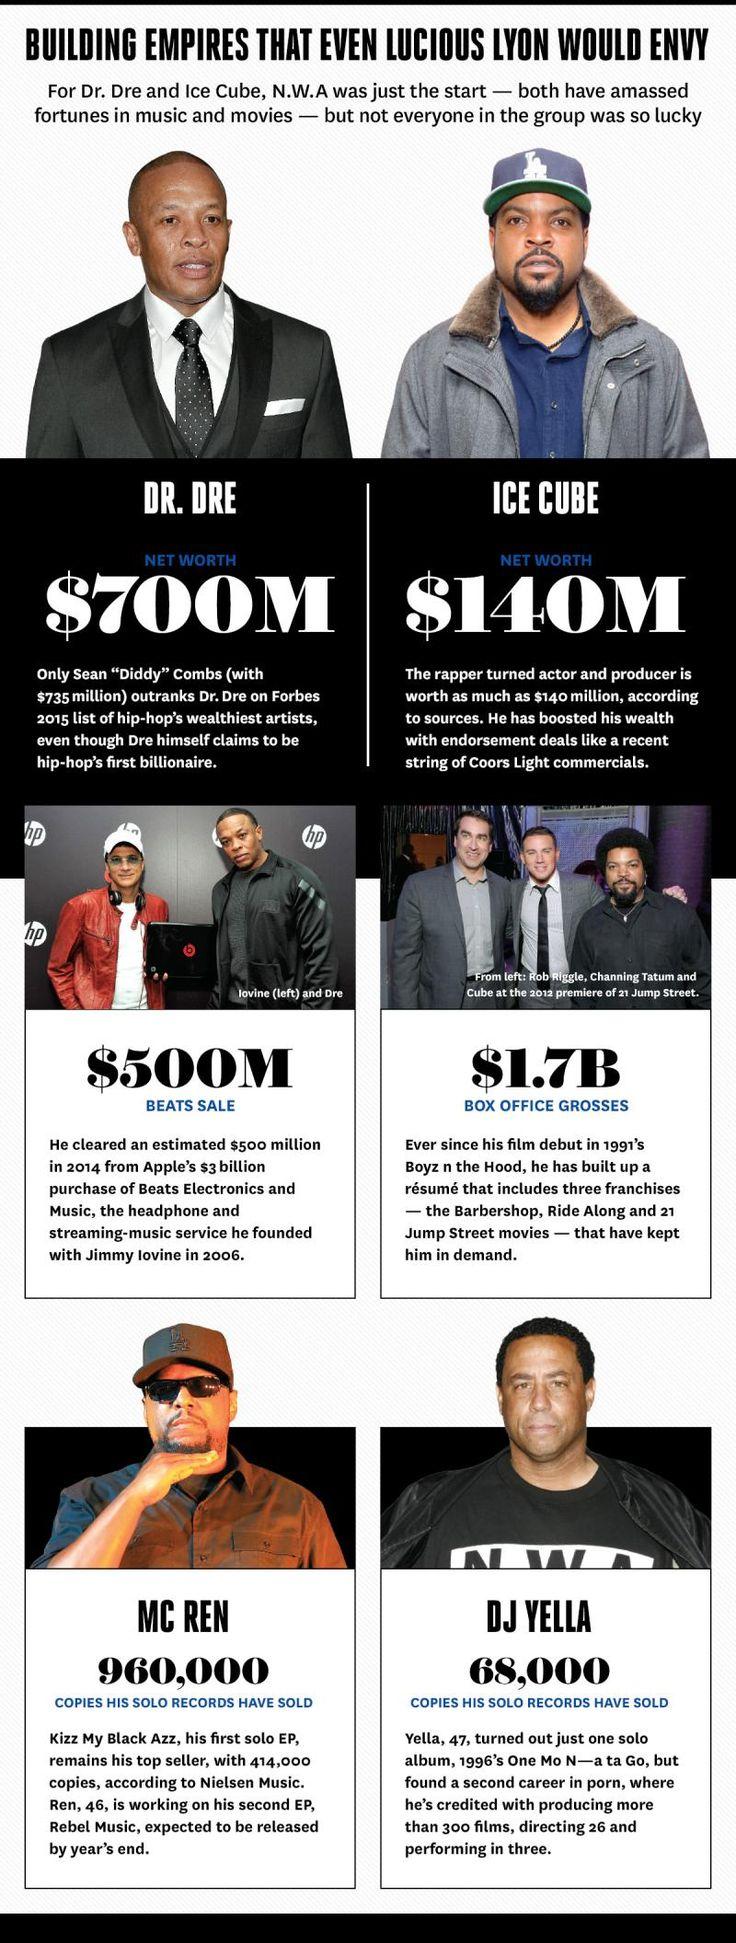 Compton Empires #IceCube #DrDre #McRen #DjYella #NWA #StraightOuttaCompton #Worth #Inc #Money #MakeMoney #Empire #Empires #Compton #LA #LosAngeles #USA